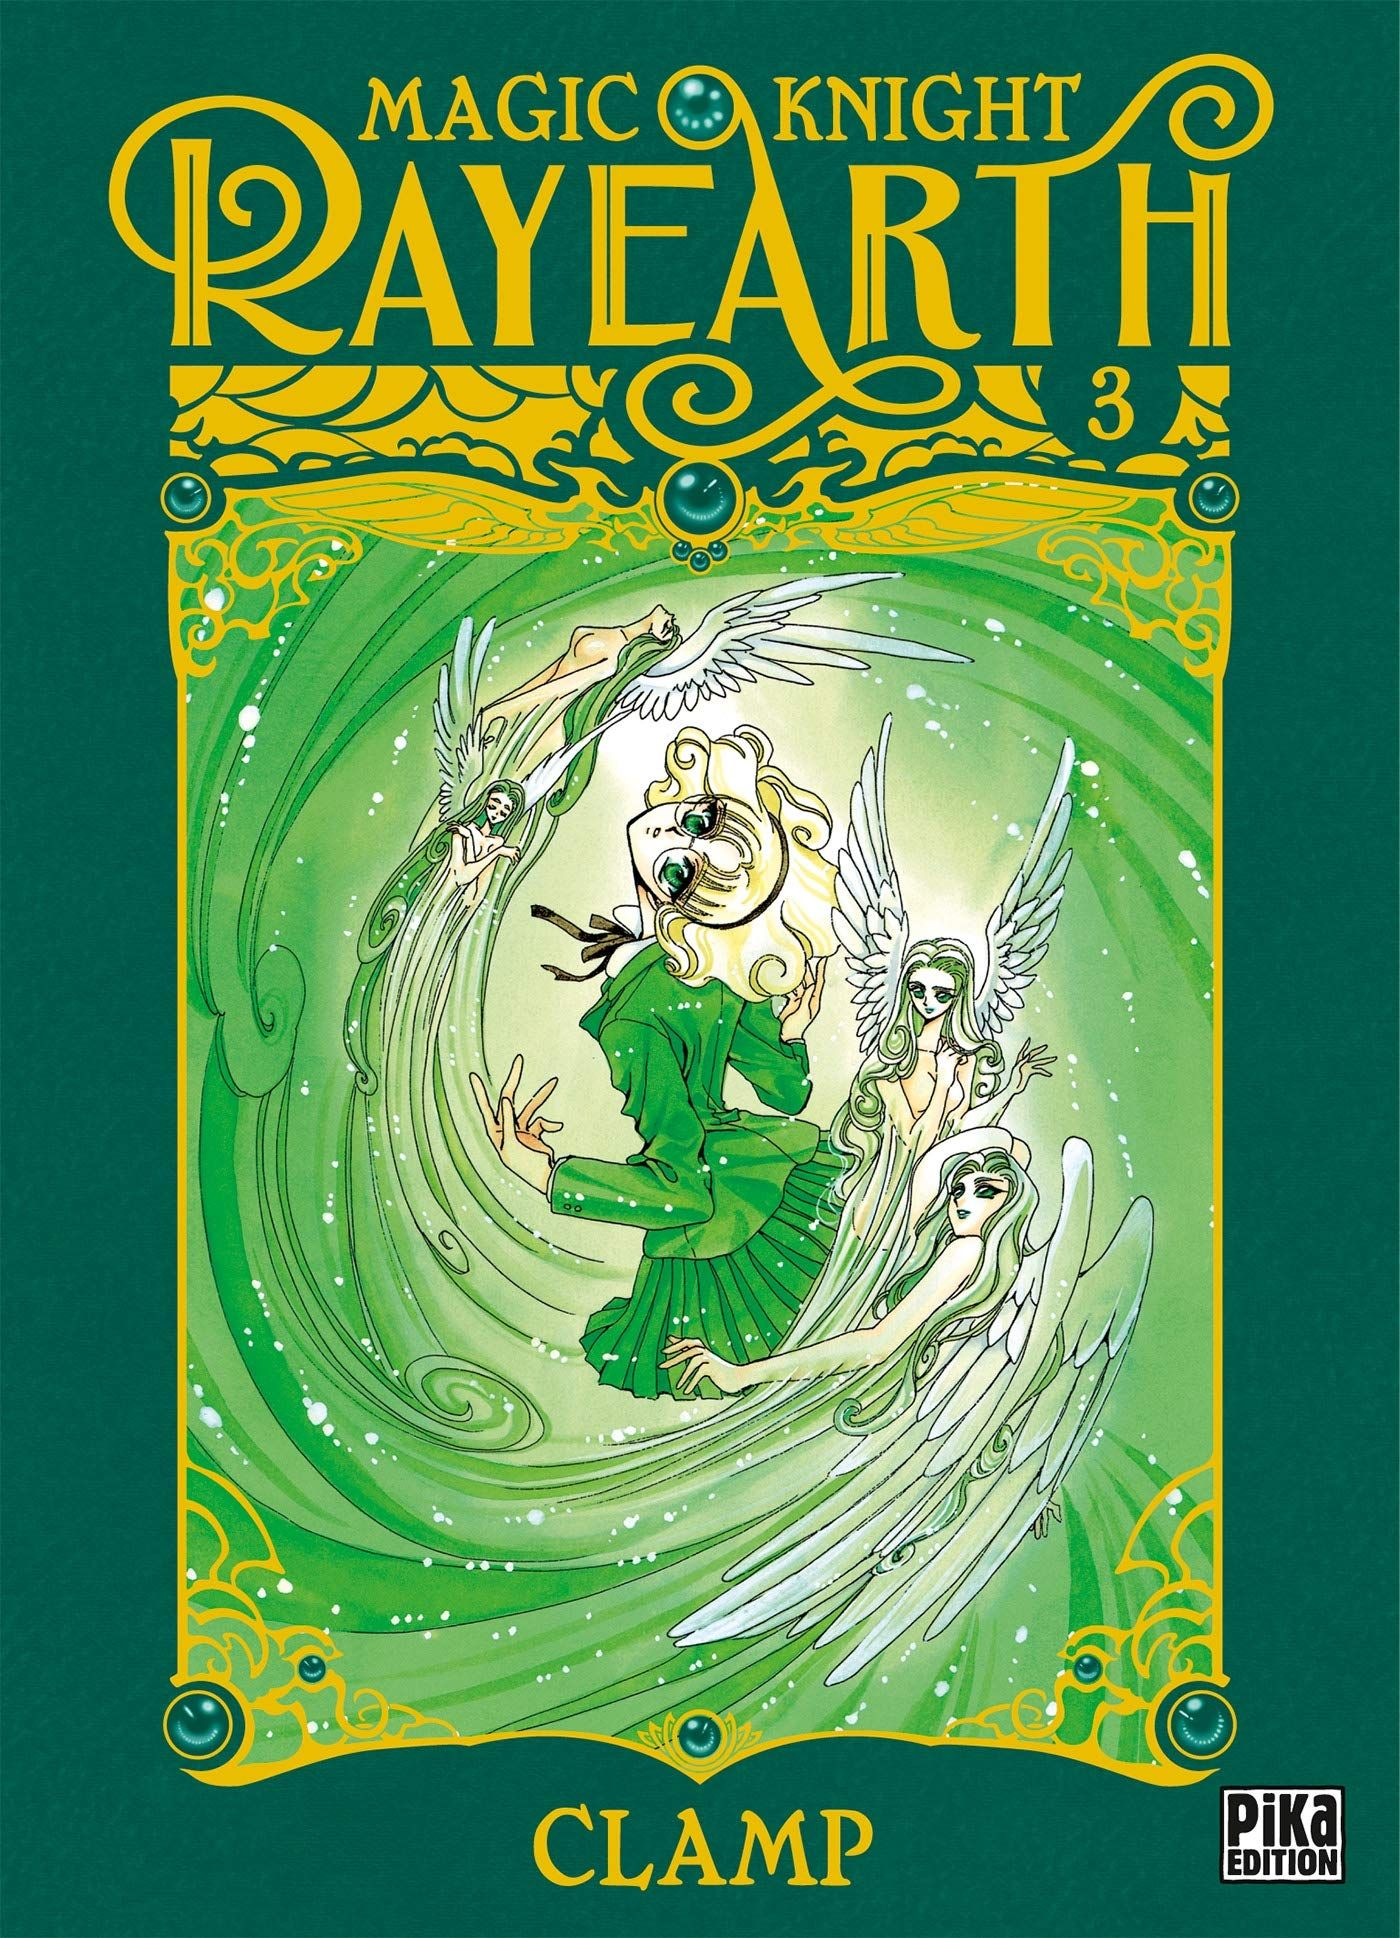 Sortie Manga au Québec JUIN 2021 Magic-knight-rayearth-20-ans-3-pika